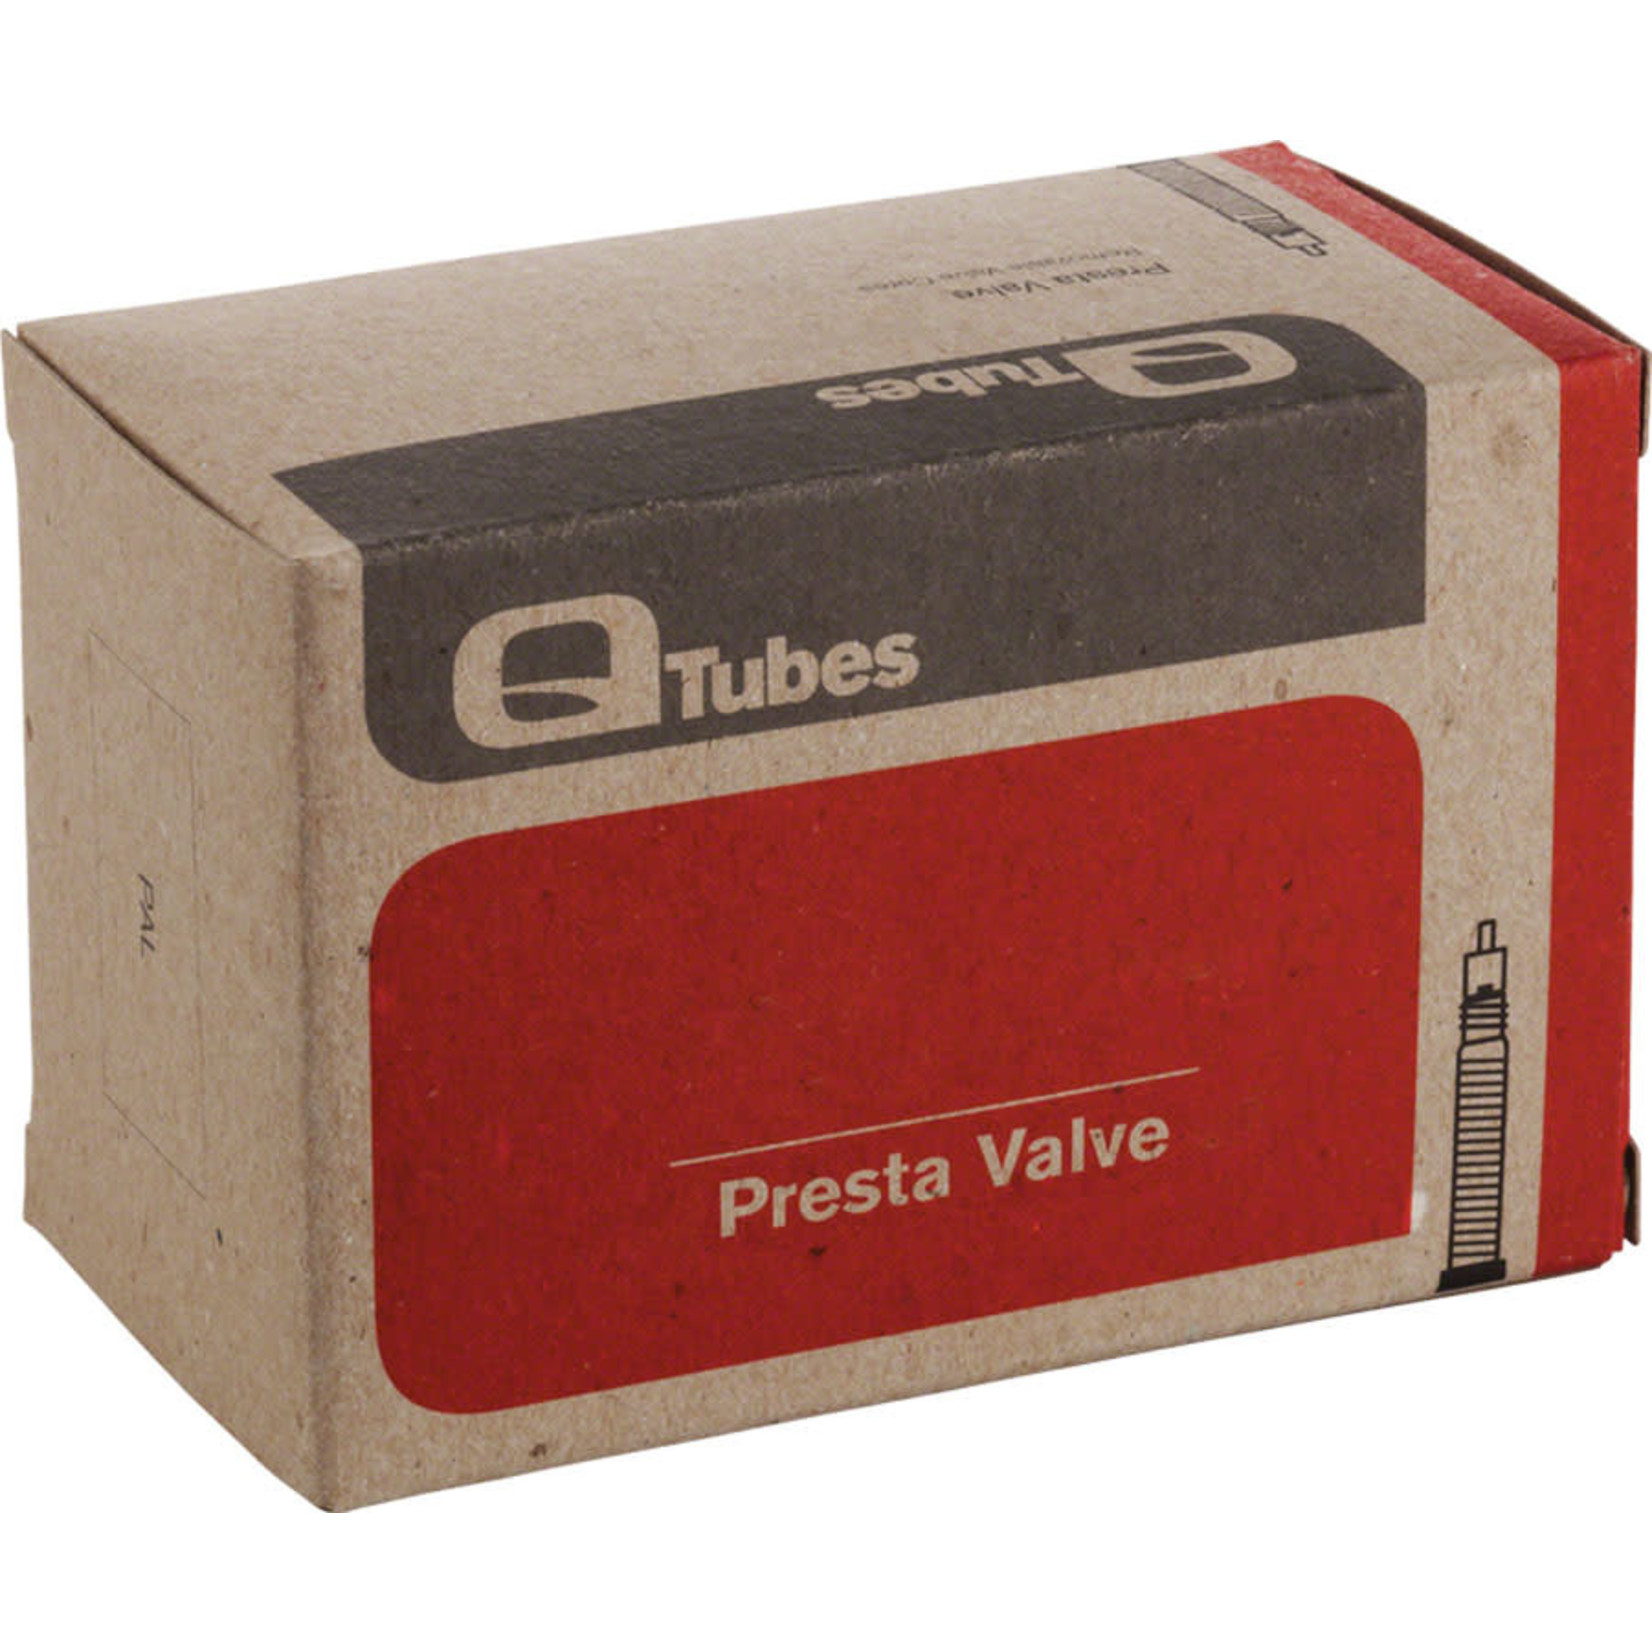 "Q-Tubes Q-Tubes 24"" x 2.75-3.0"" Tube: Low Lead 32mm Presta Valve"